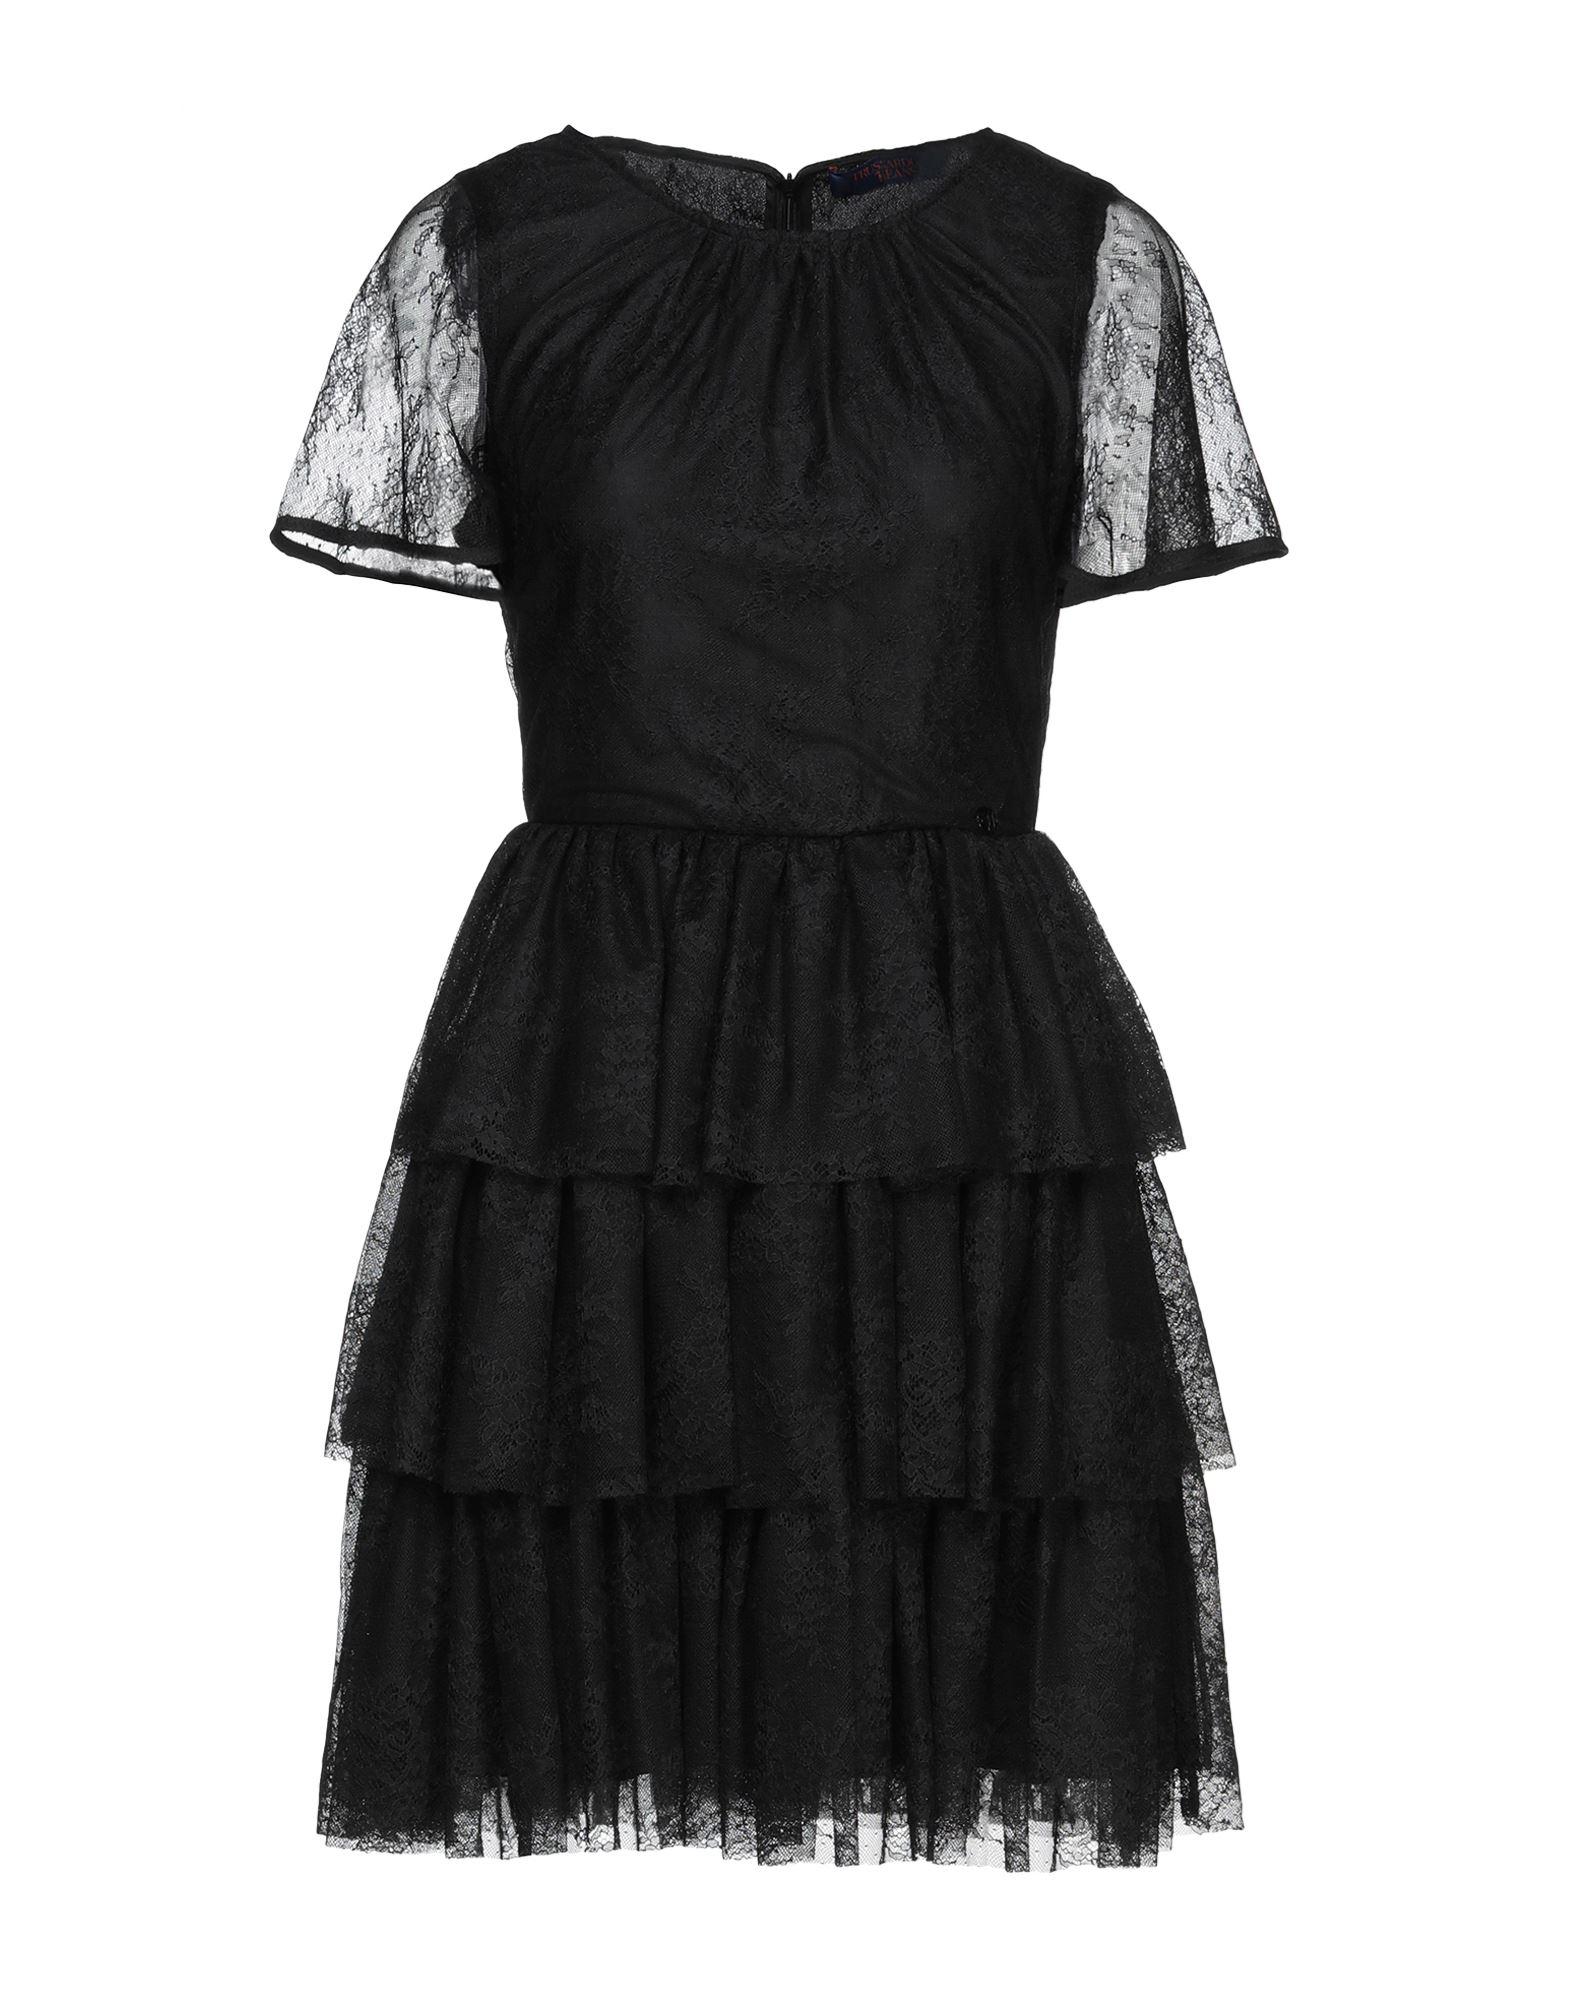 Фото - TRUSSARDI JEANS Короткое платье платье trussardi jeans платье